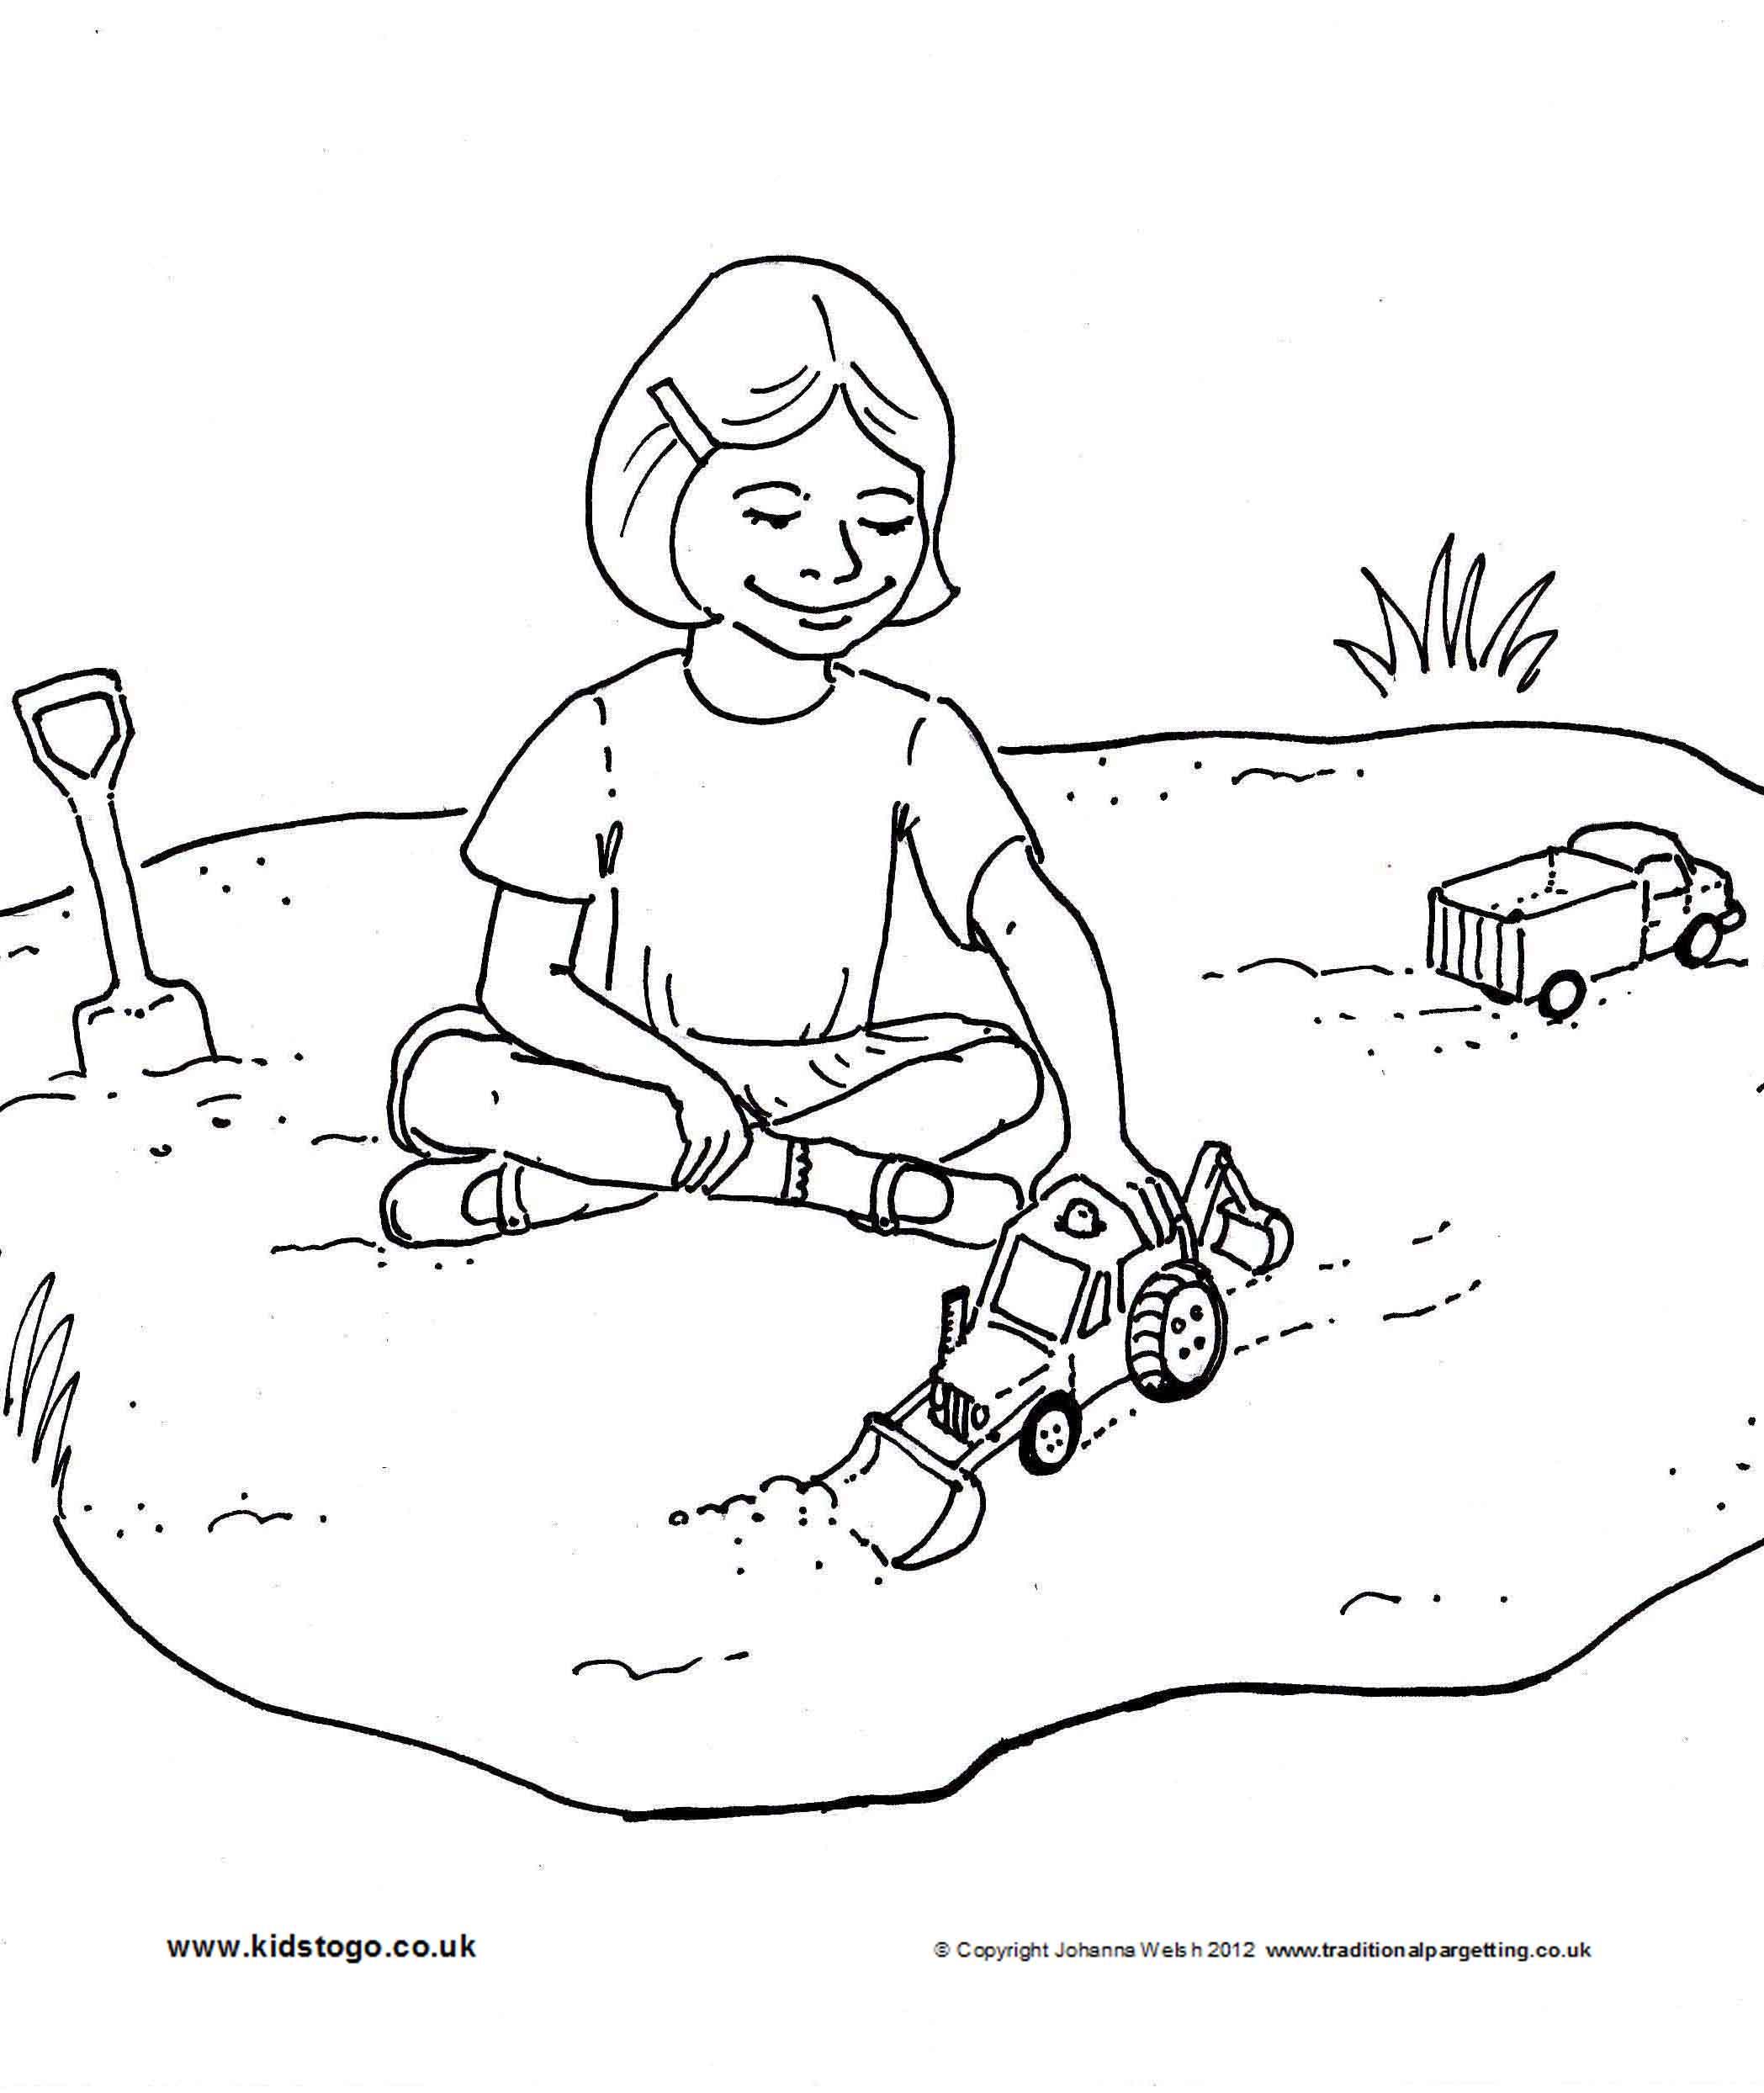 Challenging Gender Stereotypes « Childminding Best Practice